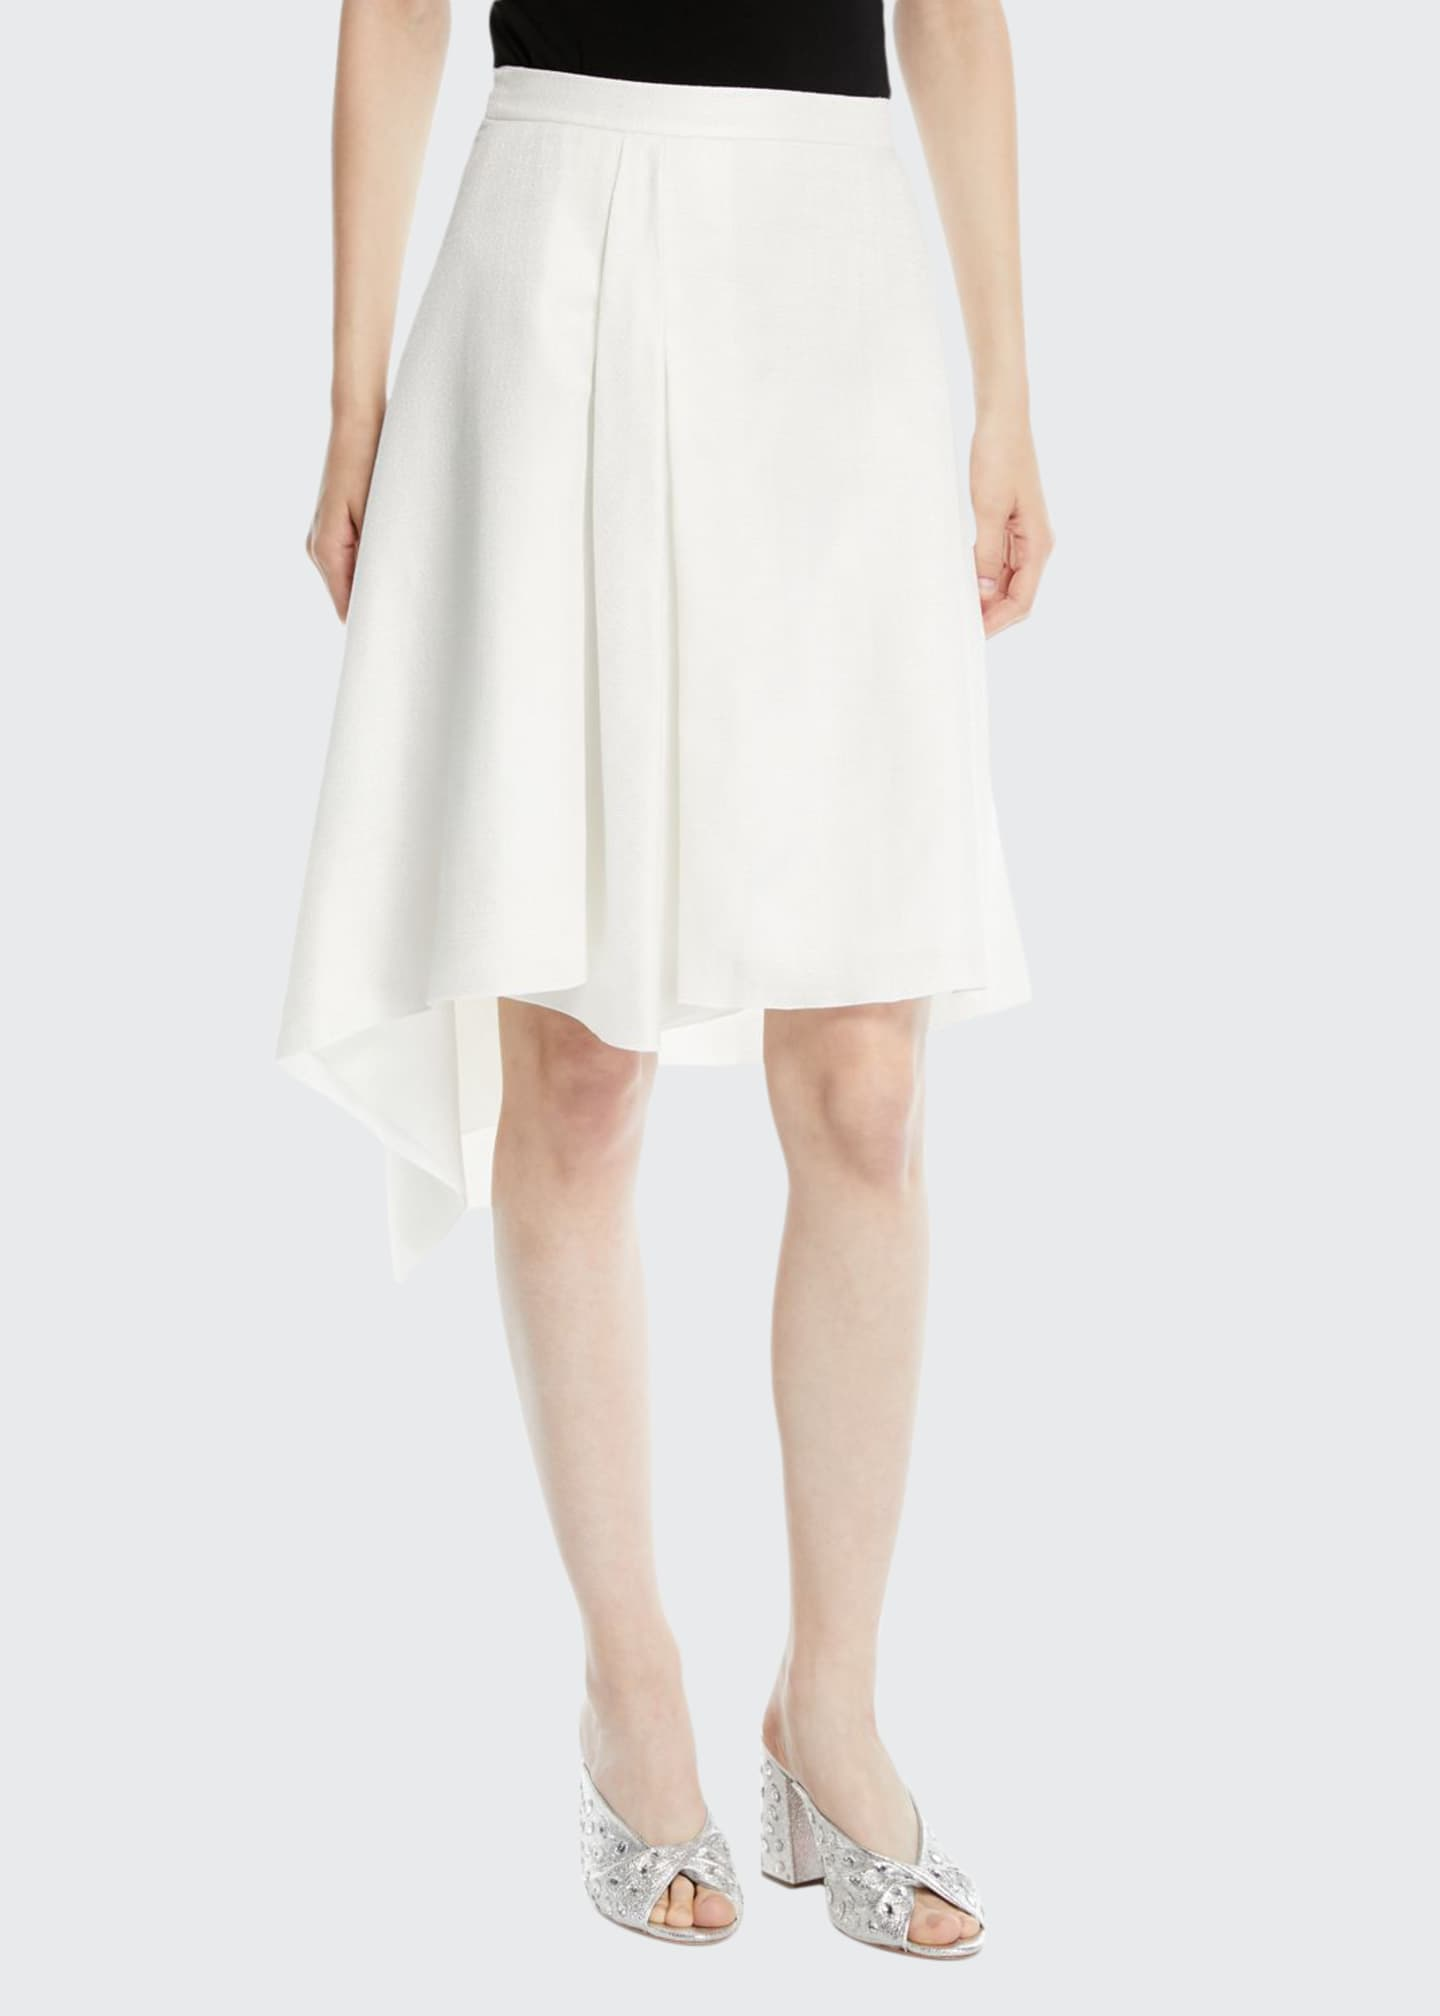 Delpozo A-Line Asymmetric Midi Skirt